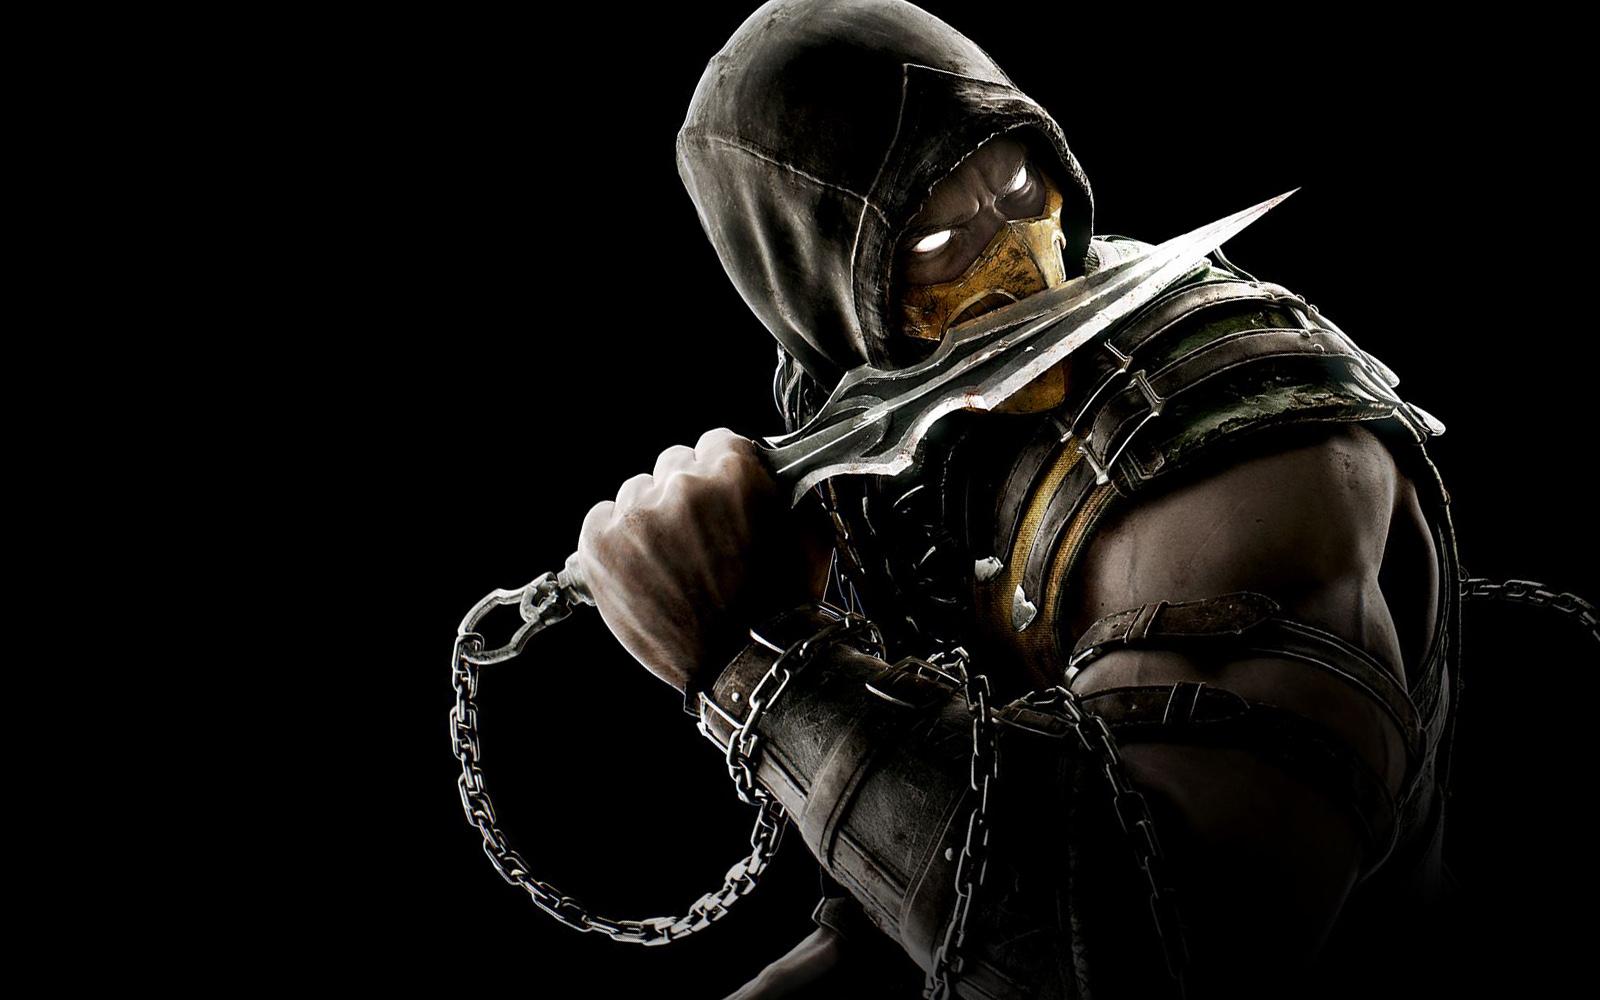 Edio completa de Mortal Kombat X chega em Maro RPG MANIA 1600x1000